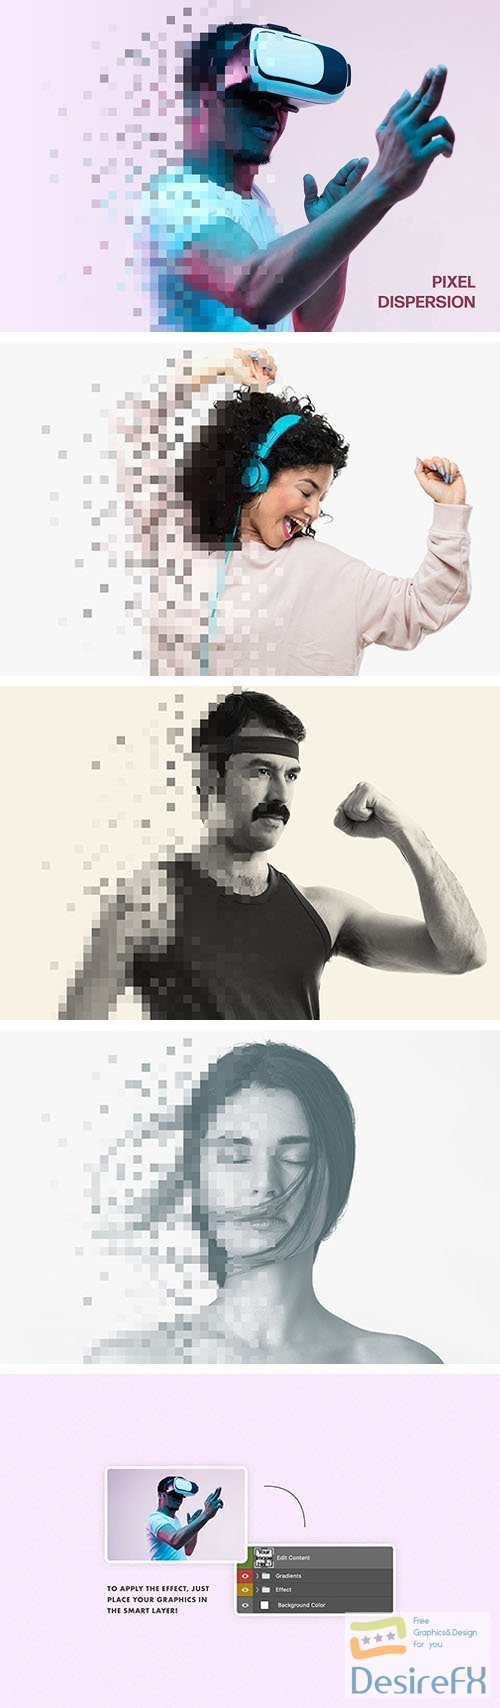 Pixel Dispersion Photo Effect PSD Template